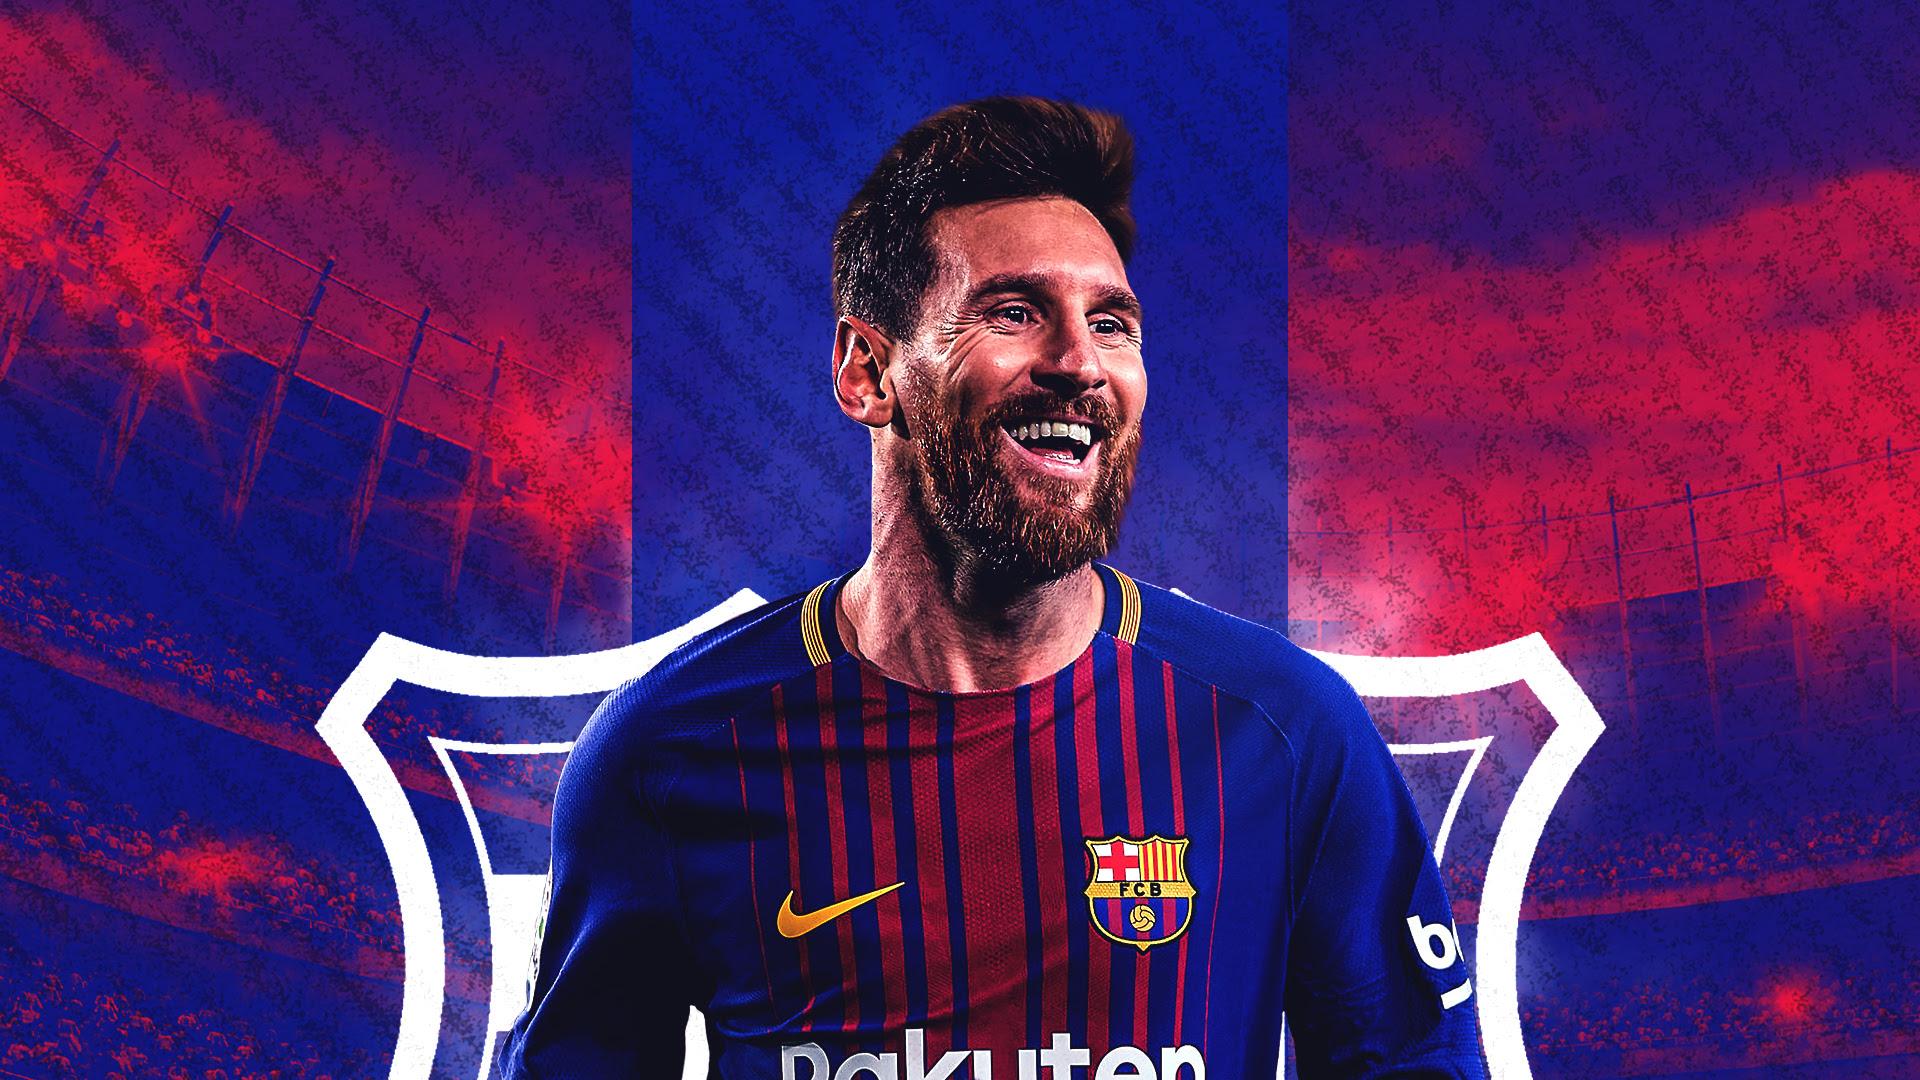 Wallpaper Lionel Messi Jordan, Lionel, Messi